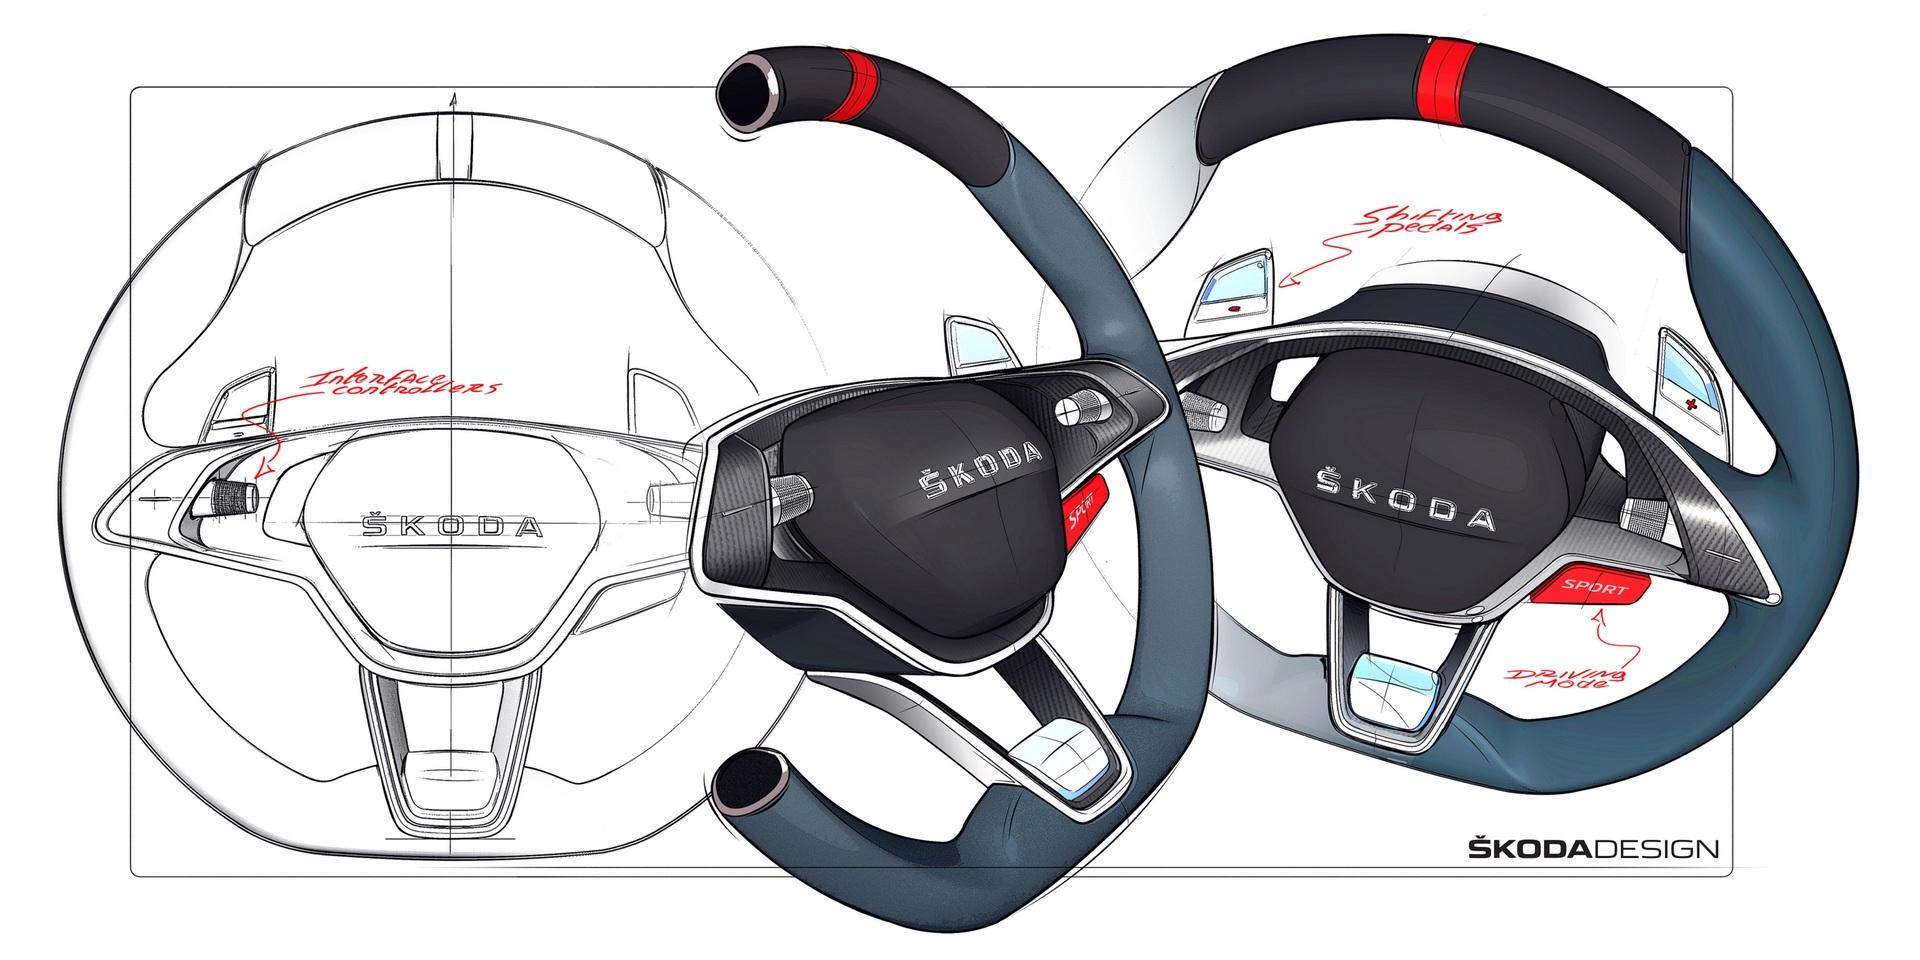 Skoda Vision RS 4